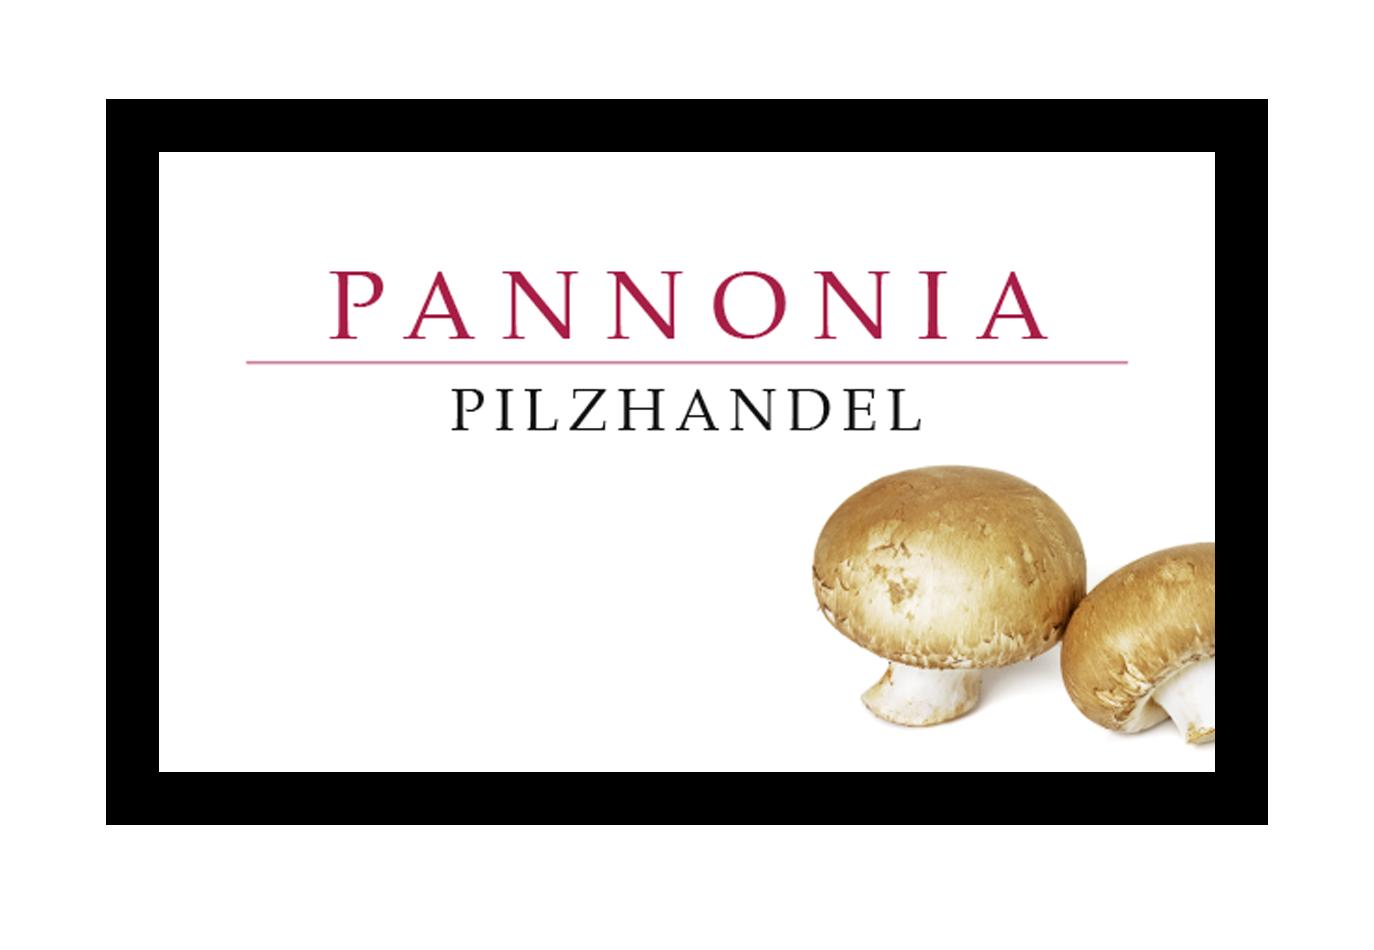 Pannonia Pilzhandel, let love guide your way, Cool Logo design, clean Logo design, Sleek chic, addesign